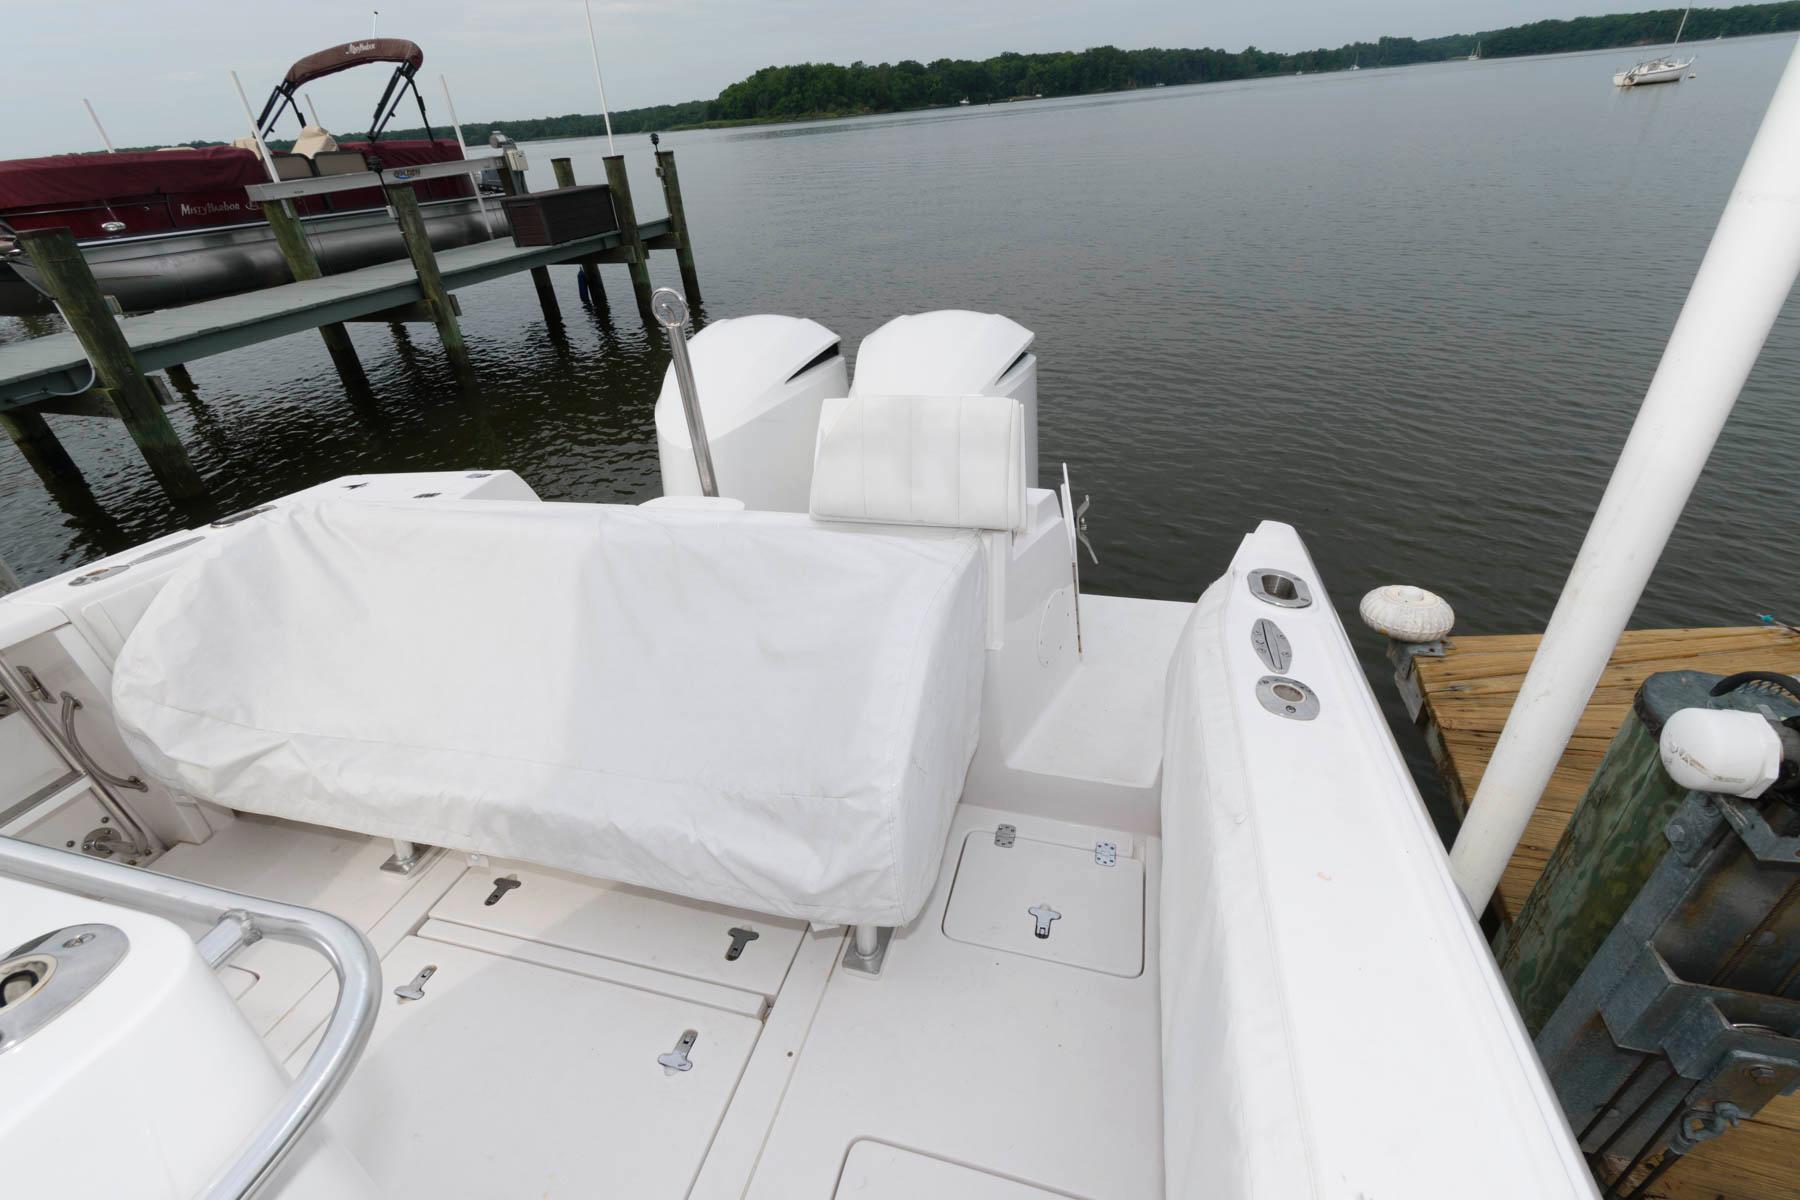 M 6173 EF Knot 10 Yacht Sales